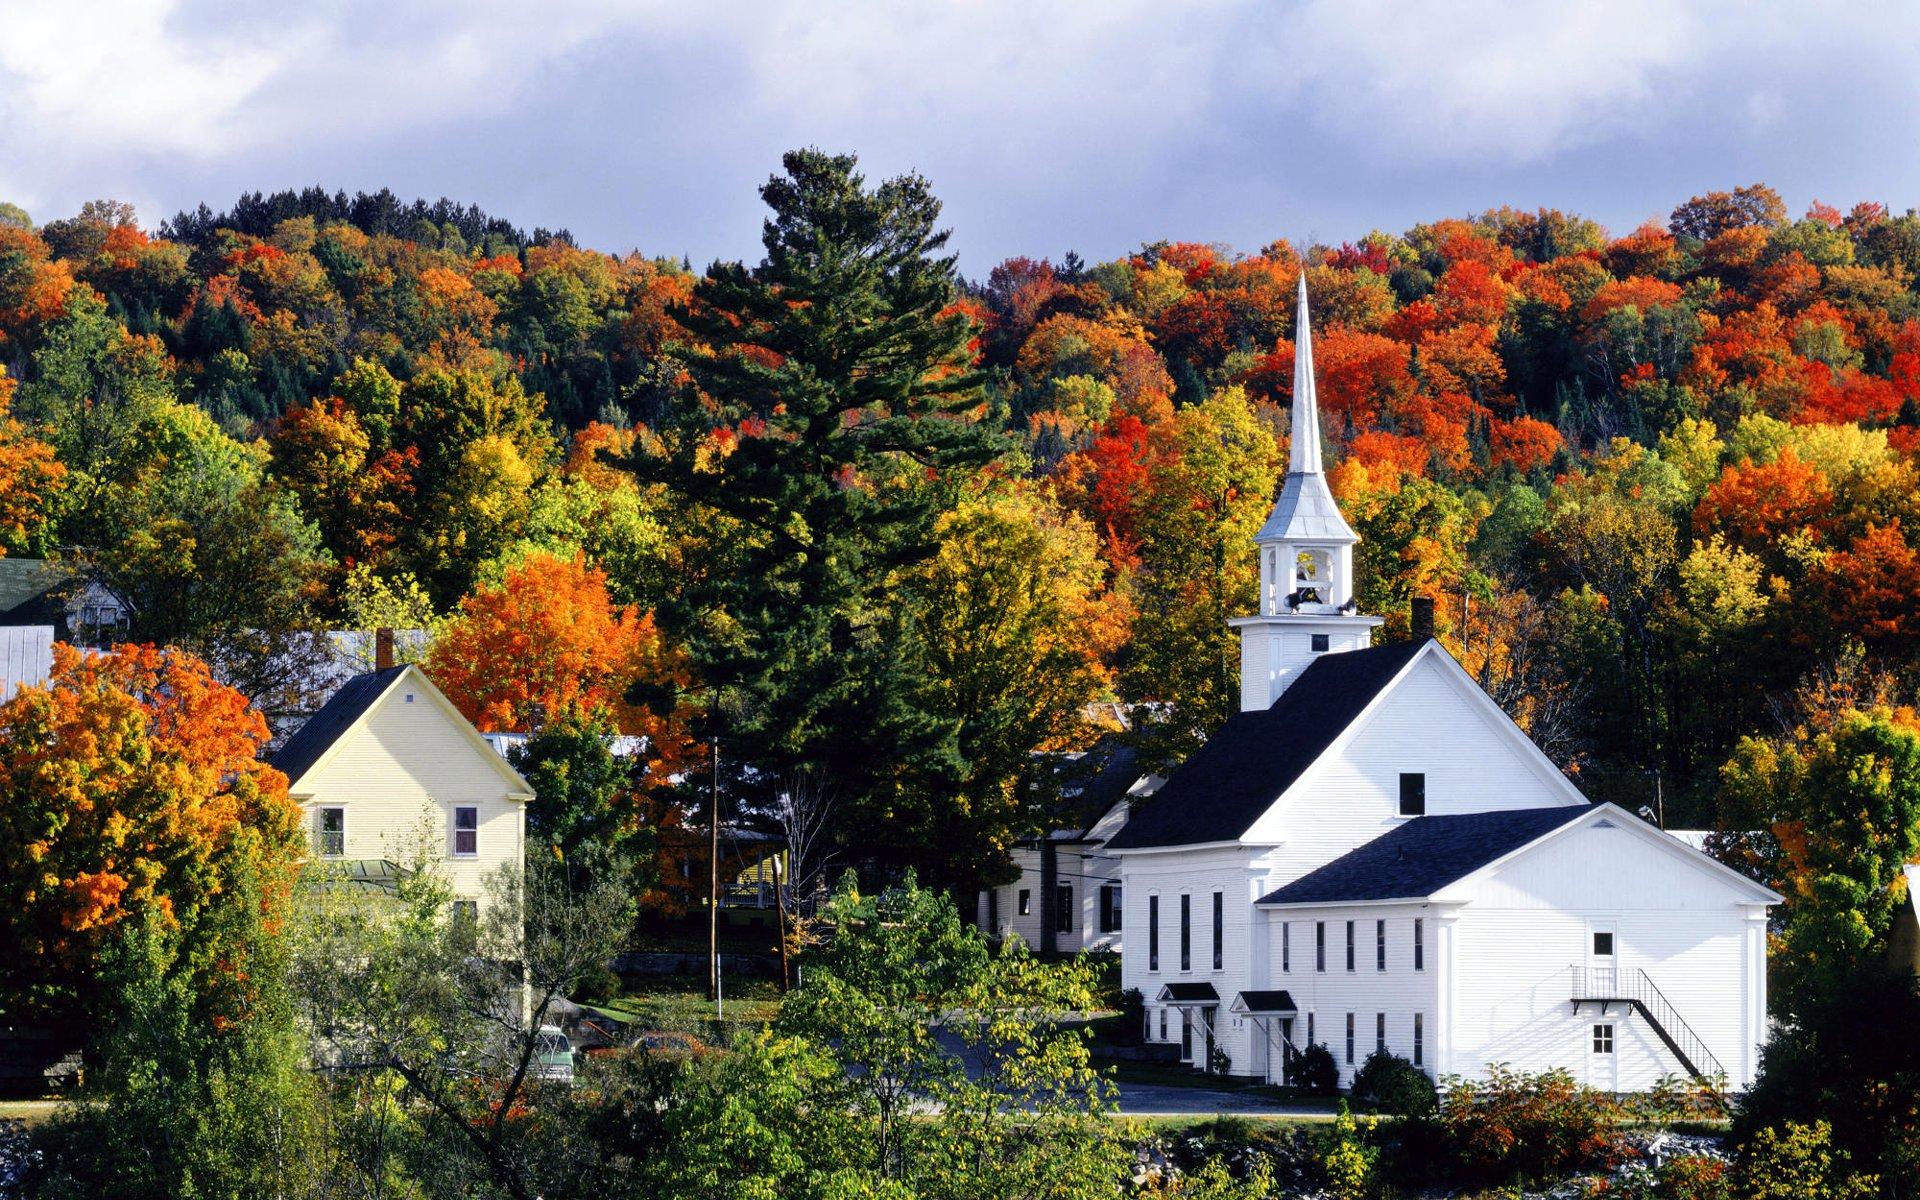 Late Fall Desktop Wallpaper Autumn In New England